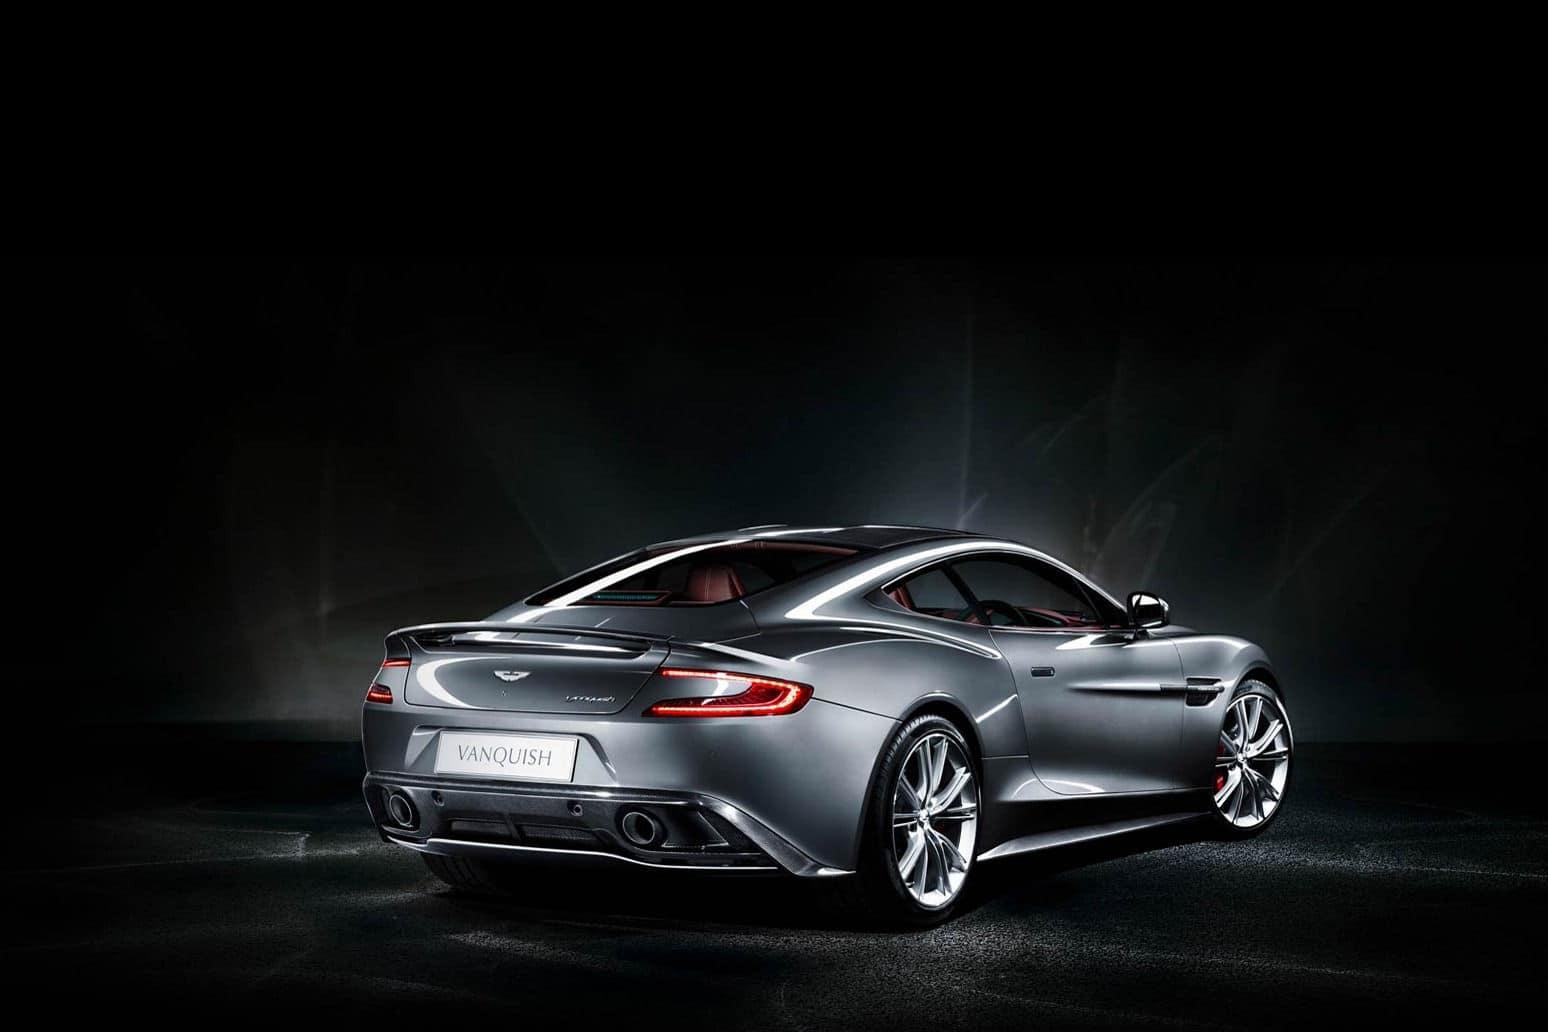 2013 Aston Martin Vanquish Mk2